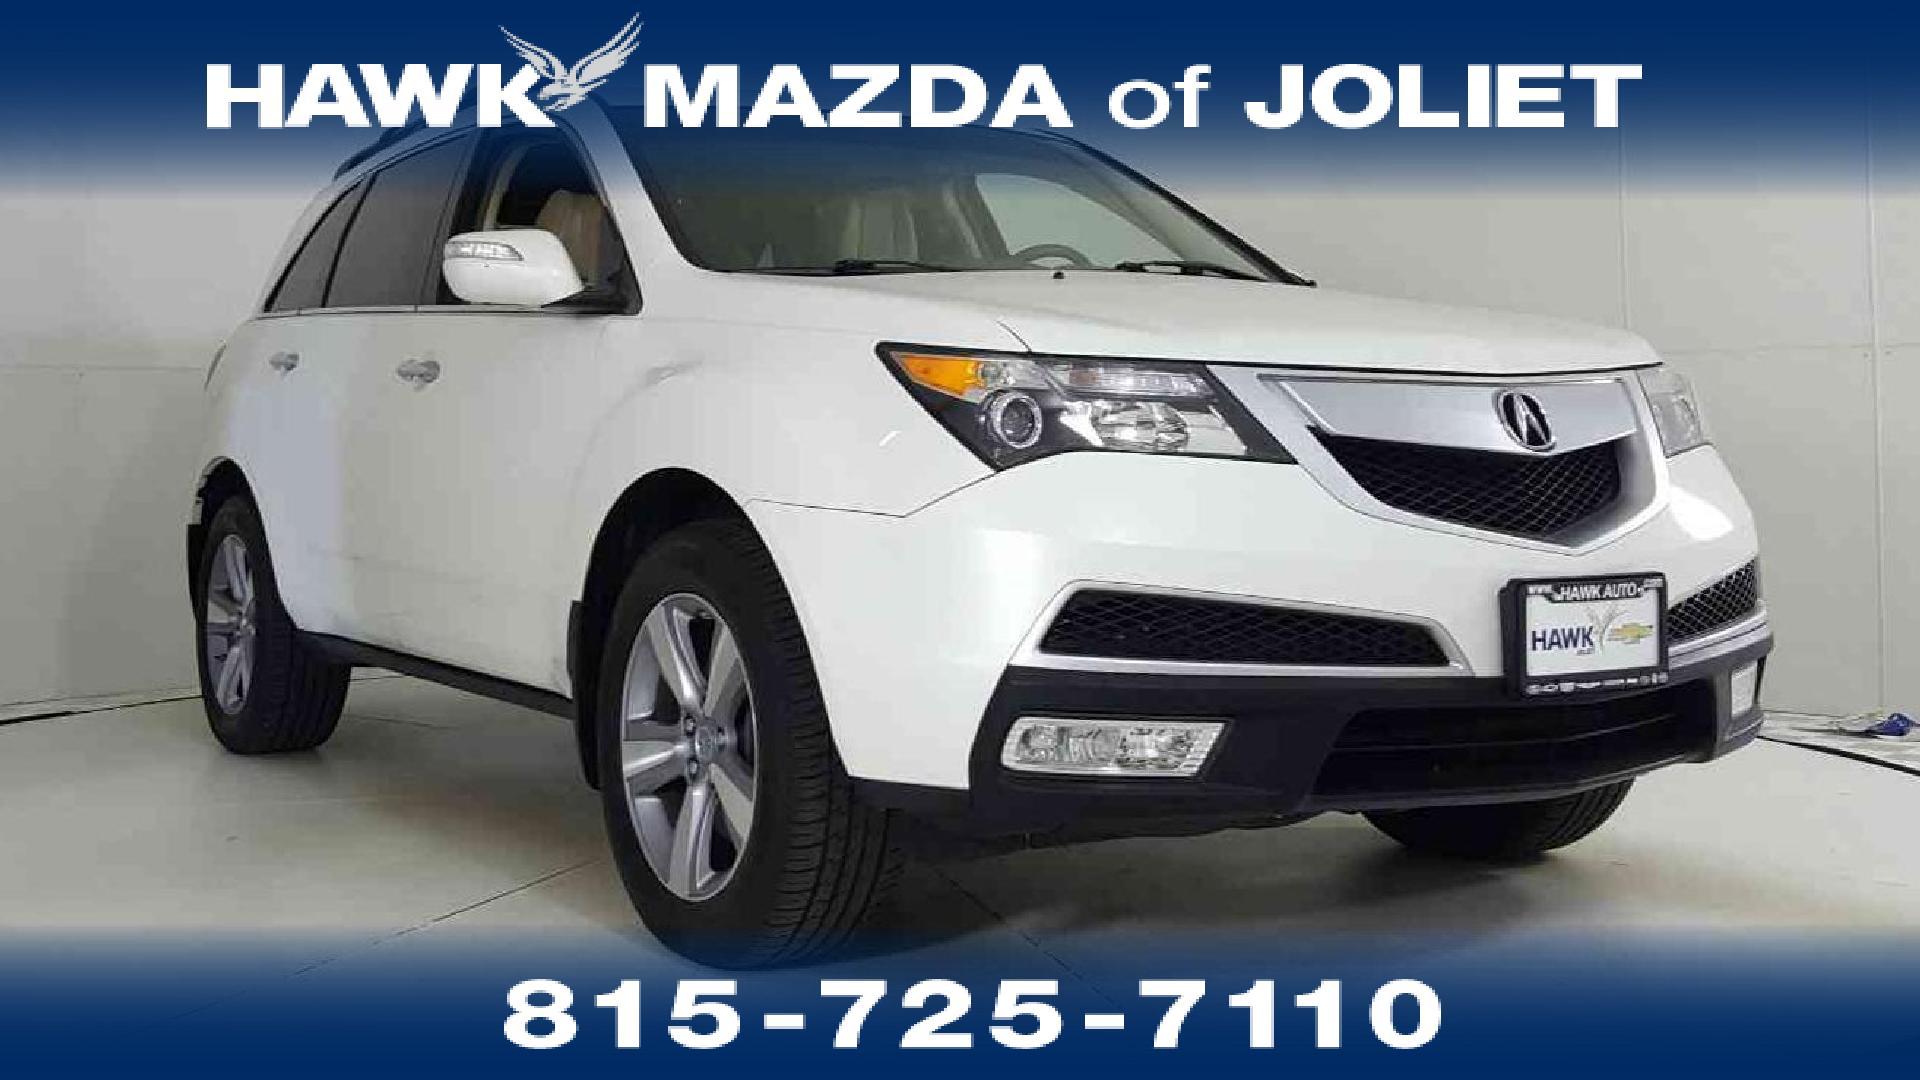 Joliet 2012 Vehicles for Sale